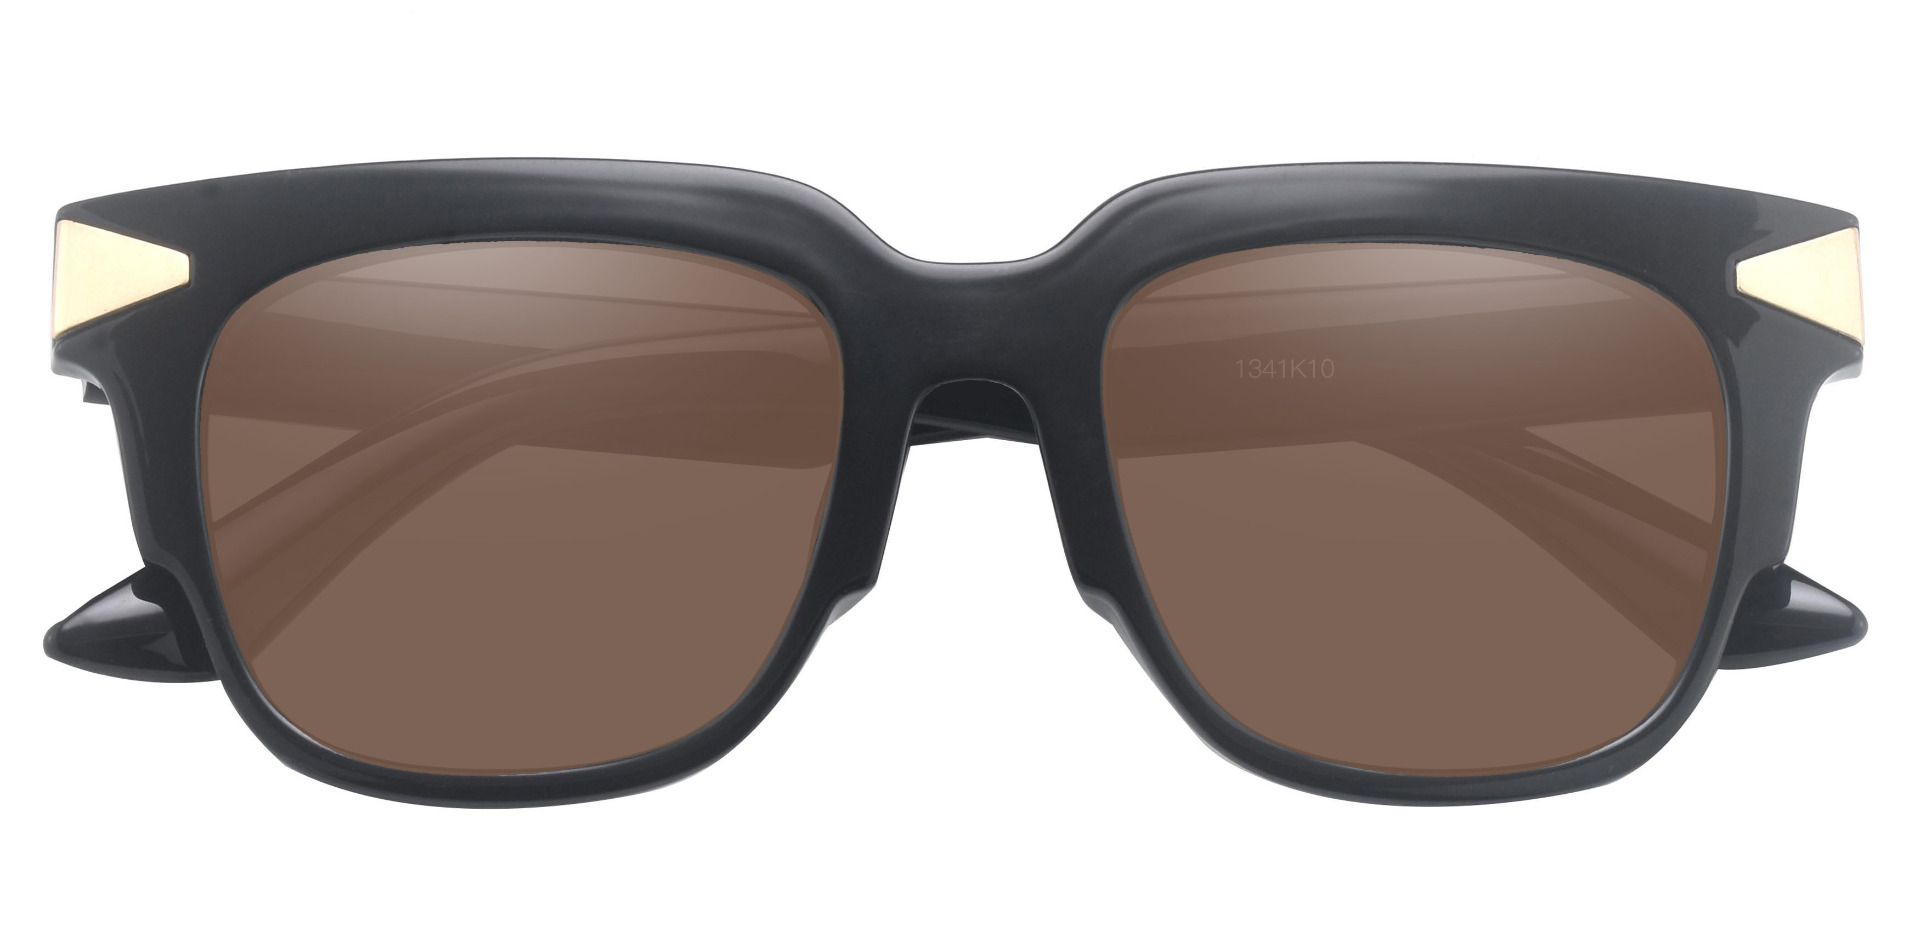 Ardent Square Progressive Sunglasses - Black Frame With Brown Lenses